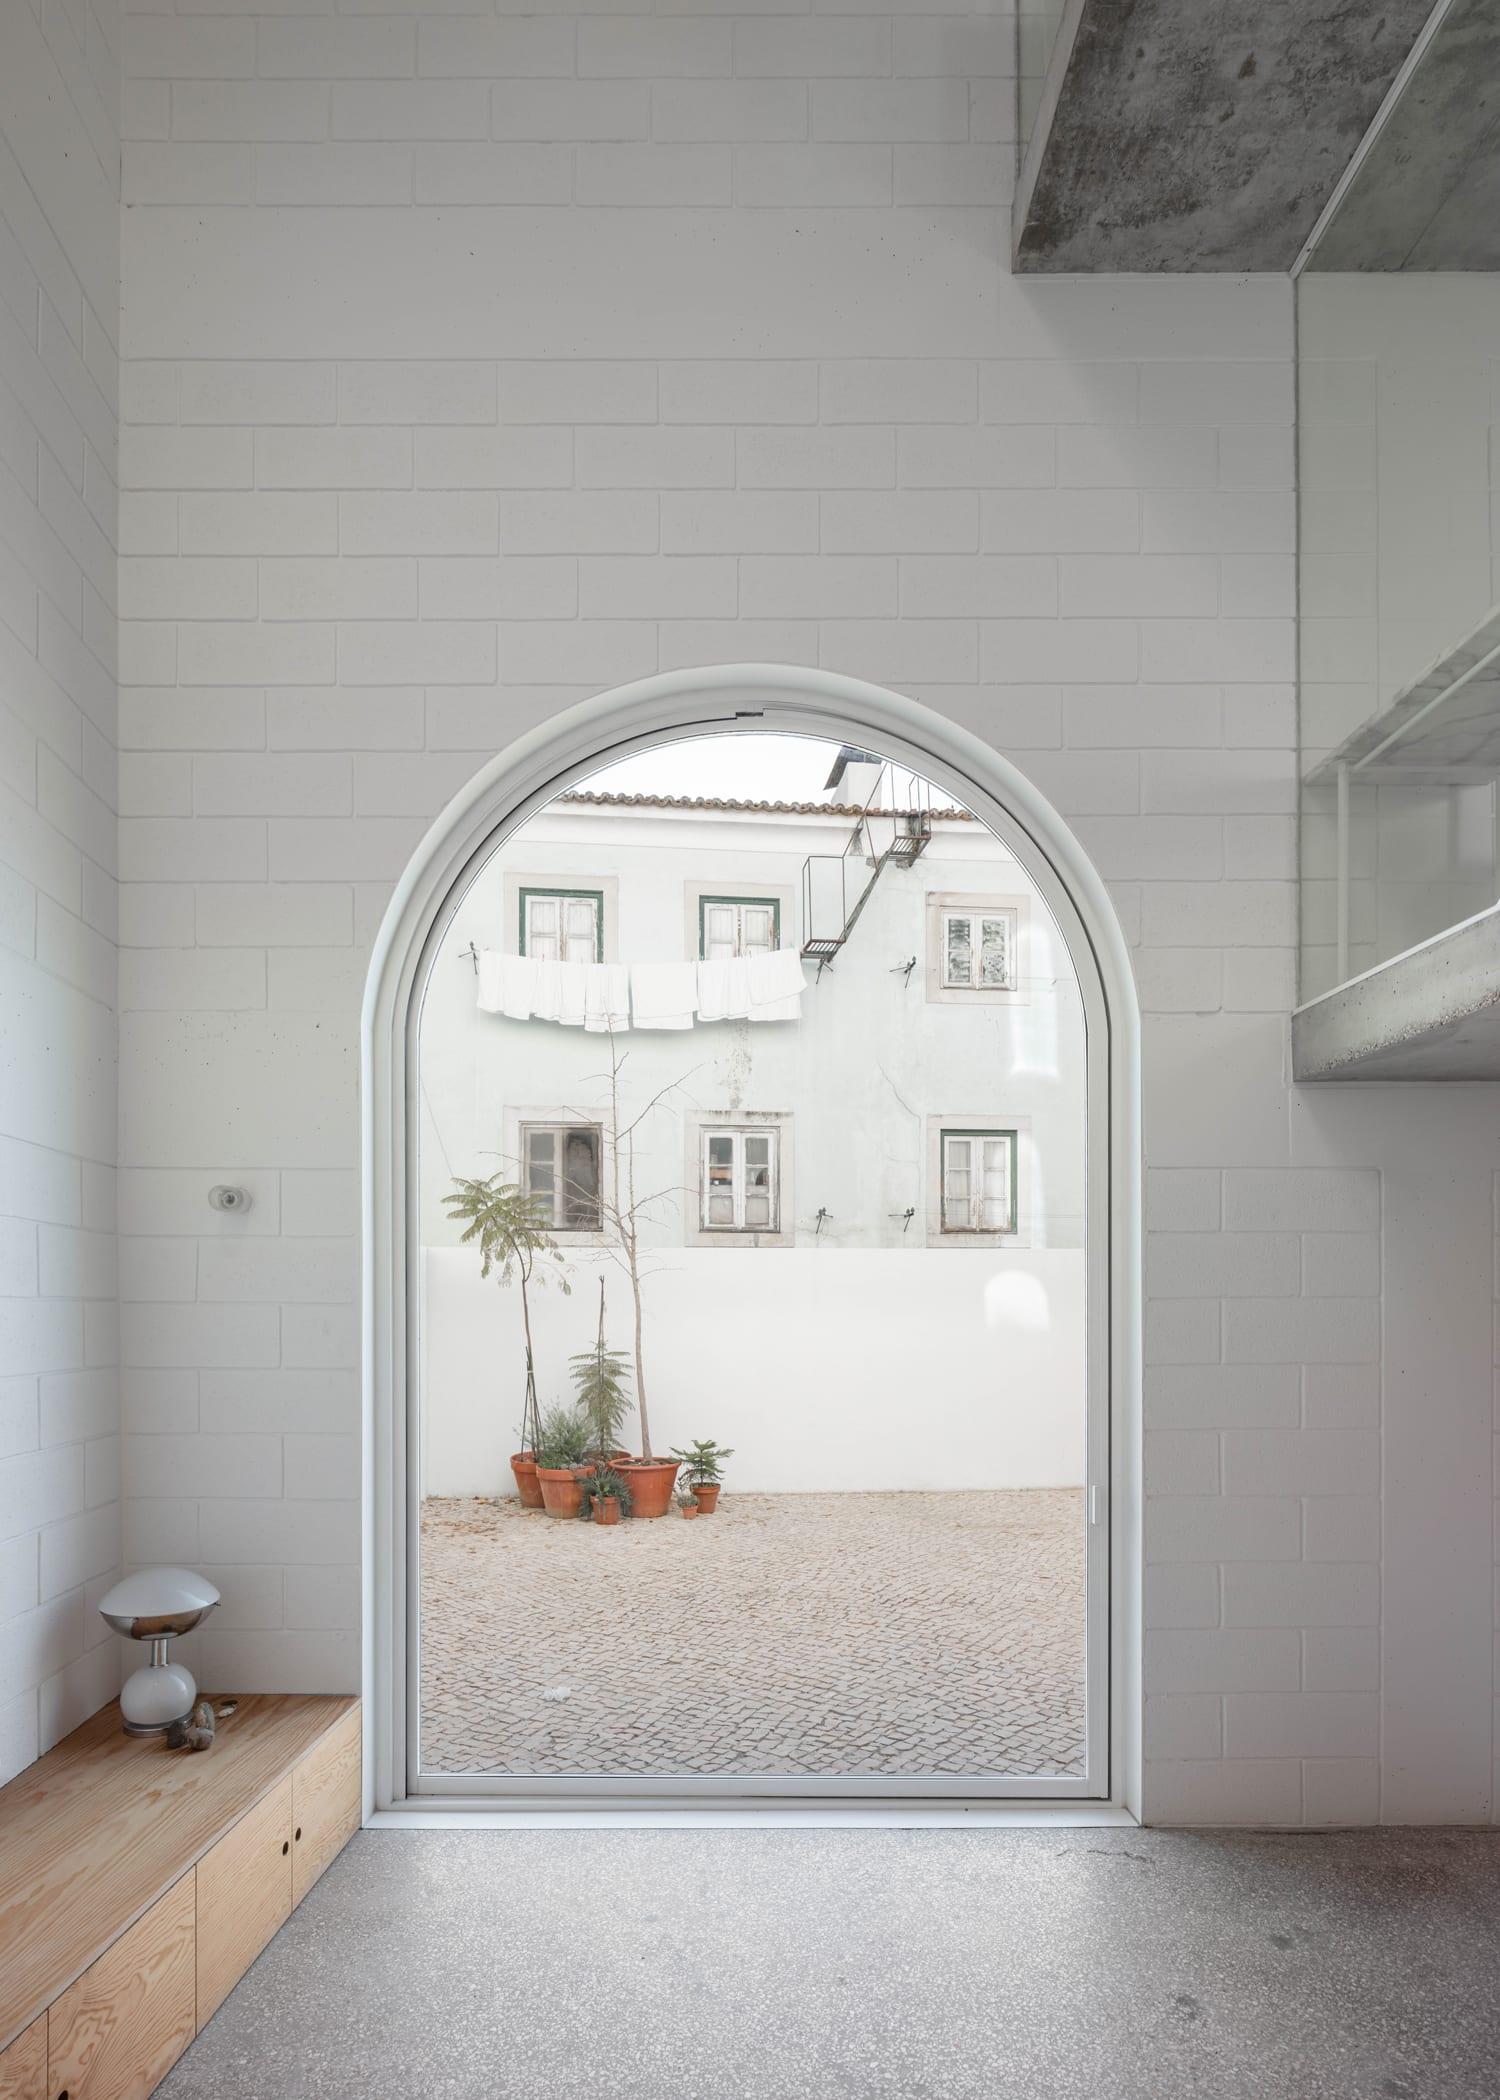 Dodged House In Lisbon By Leopold Banchini Daniel Zamarbide Yellowtrace 02